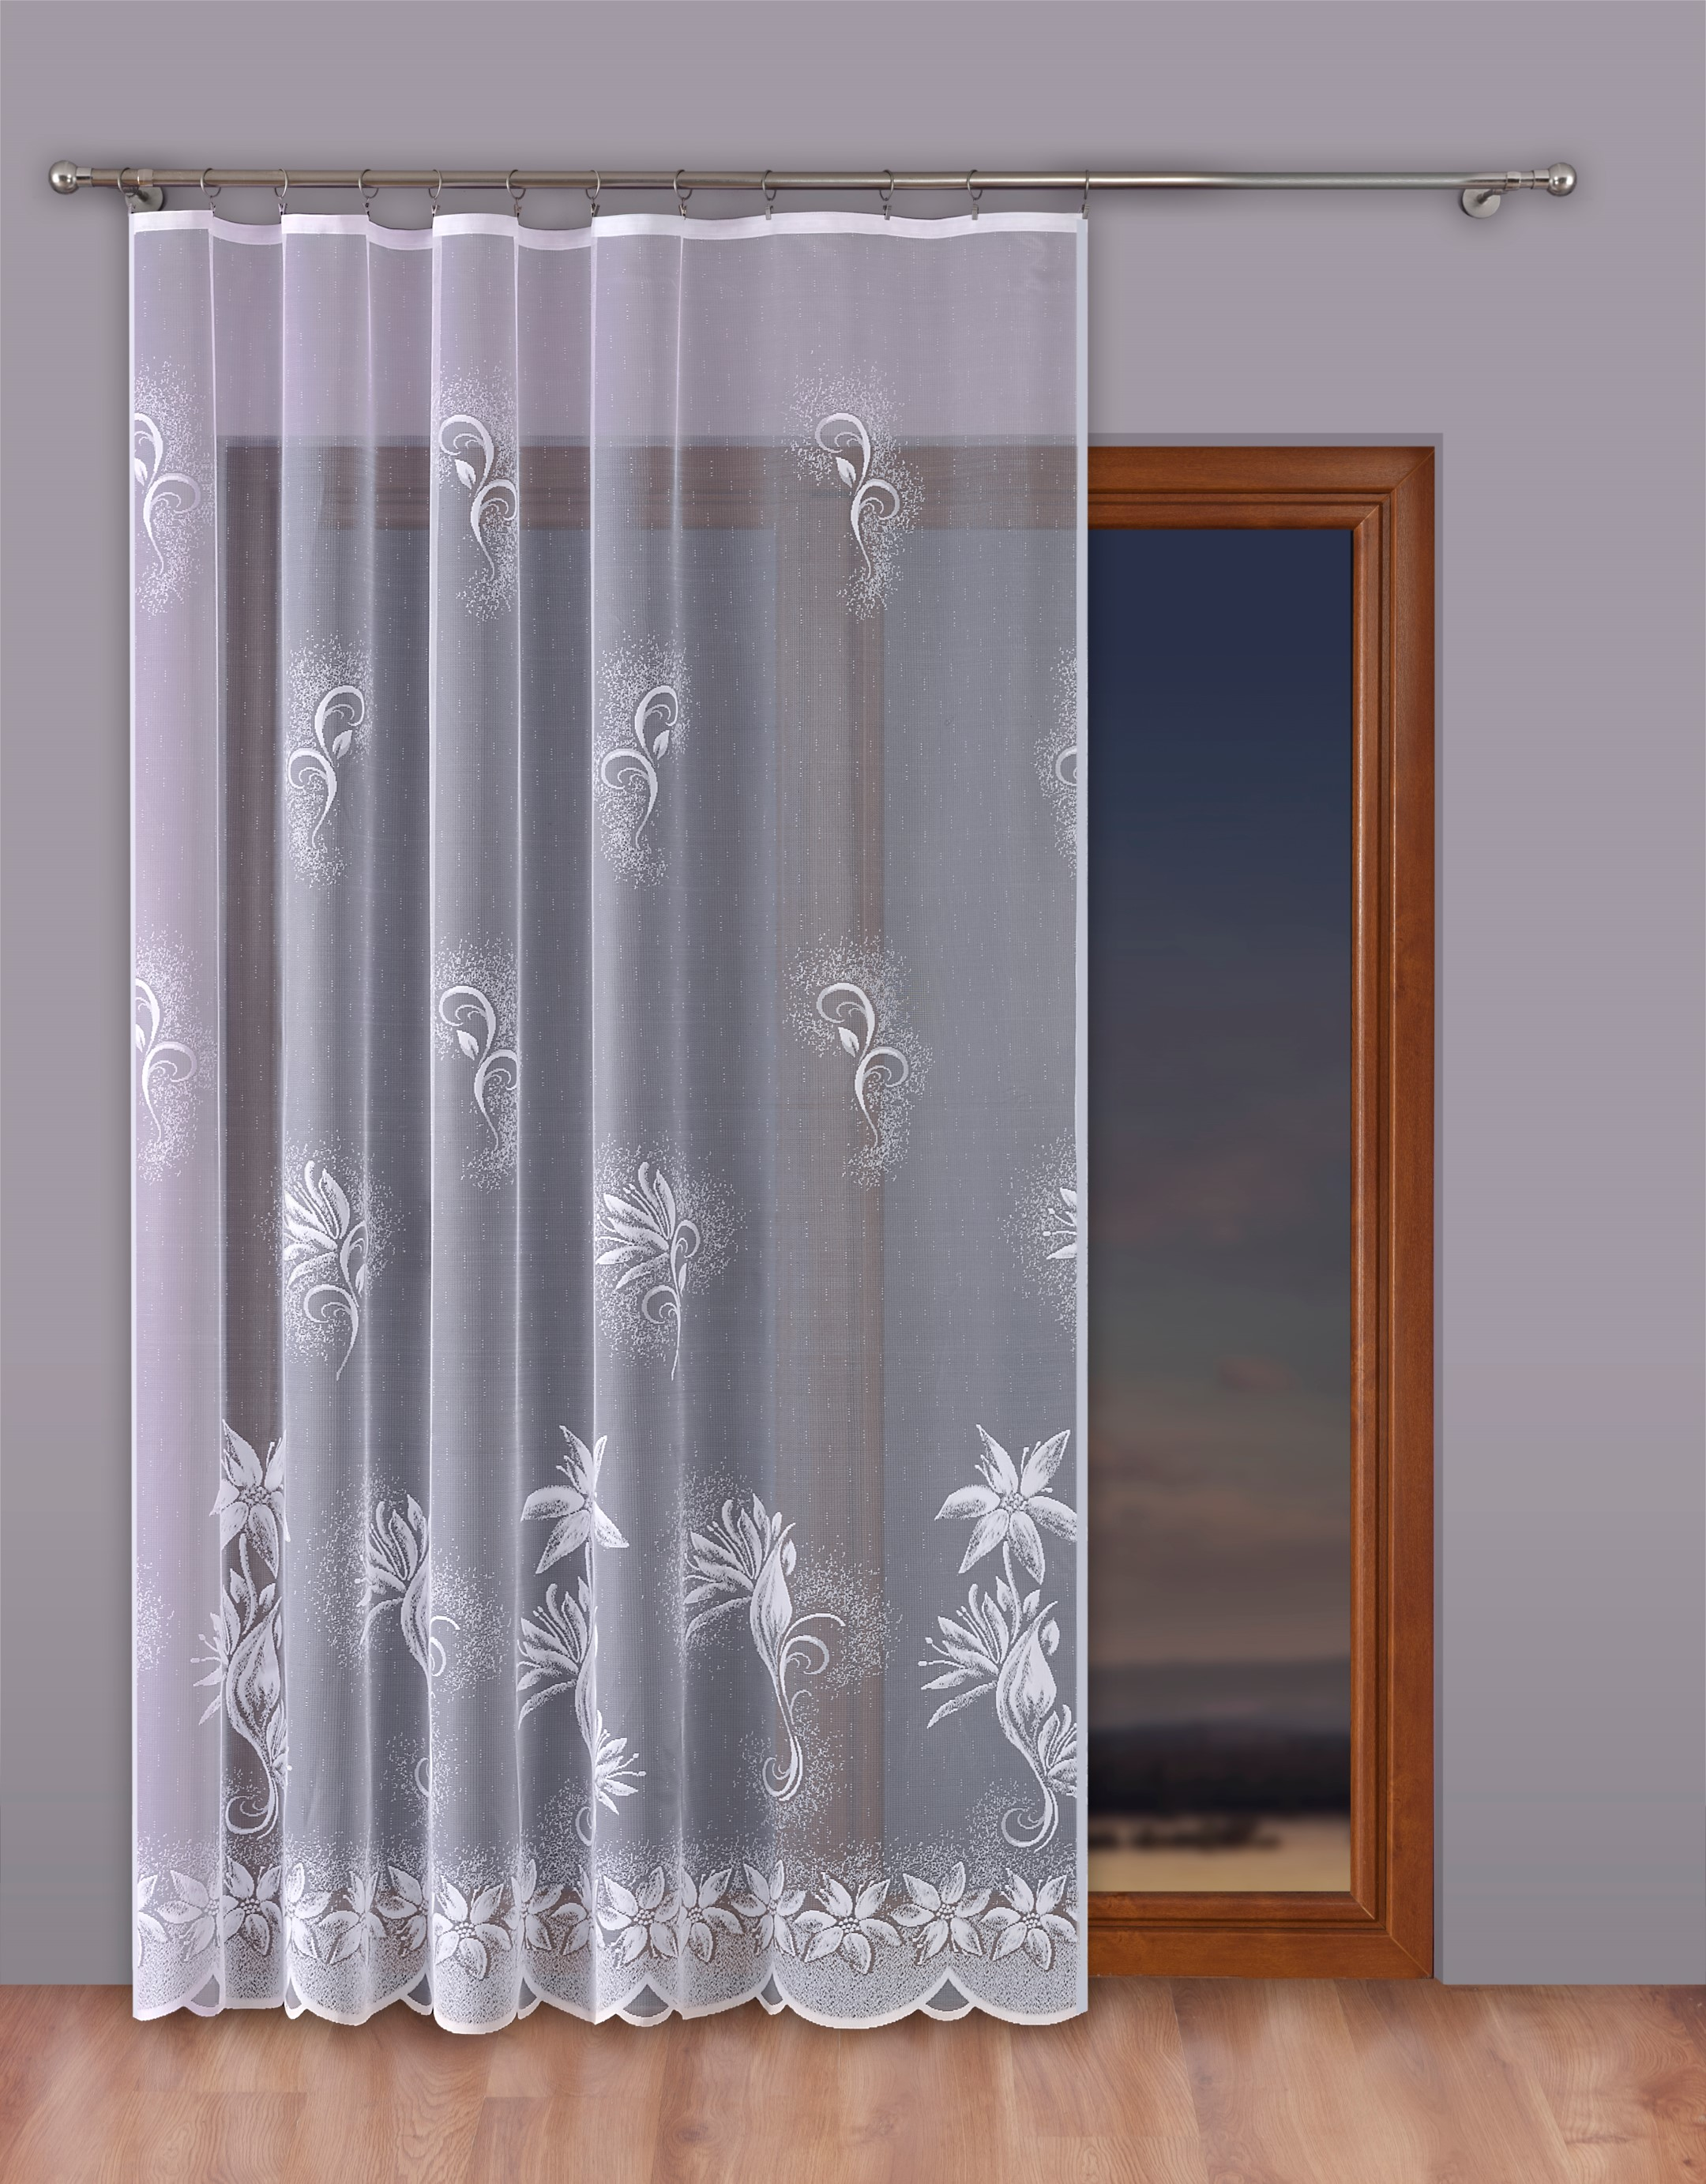 Шторы Primavera Классические шторы Moise Цвет: Белый шторы primavera классические шторы maev цвет салатовый